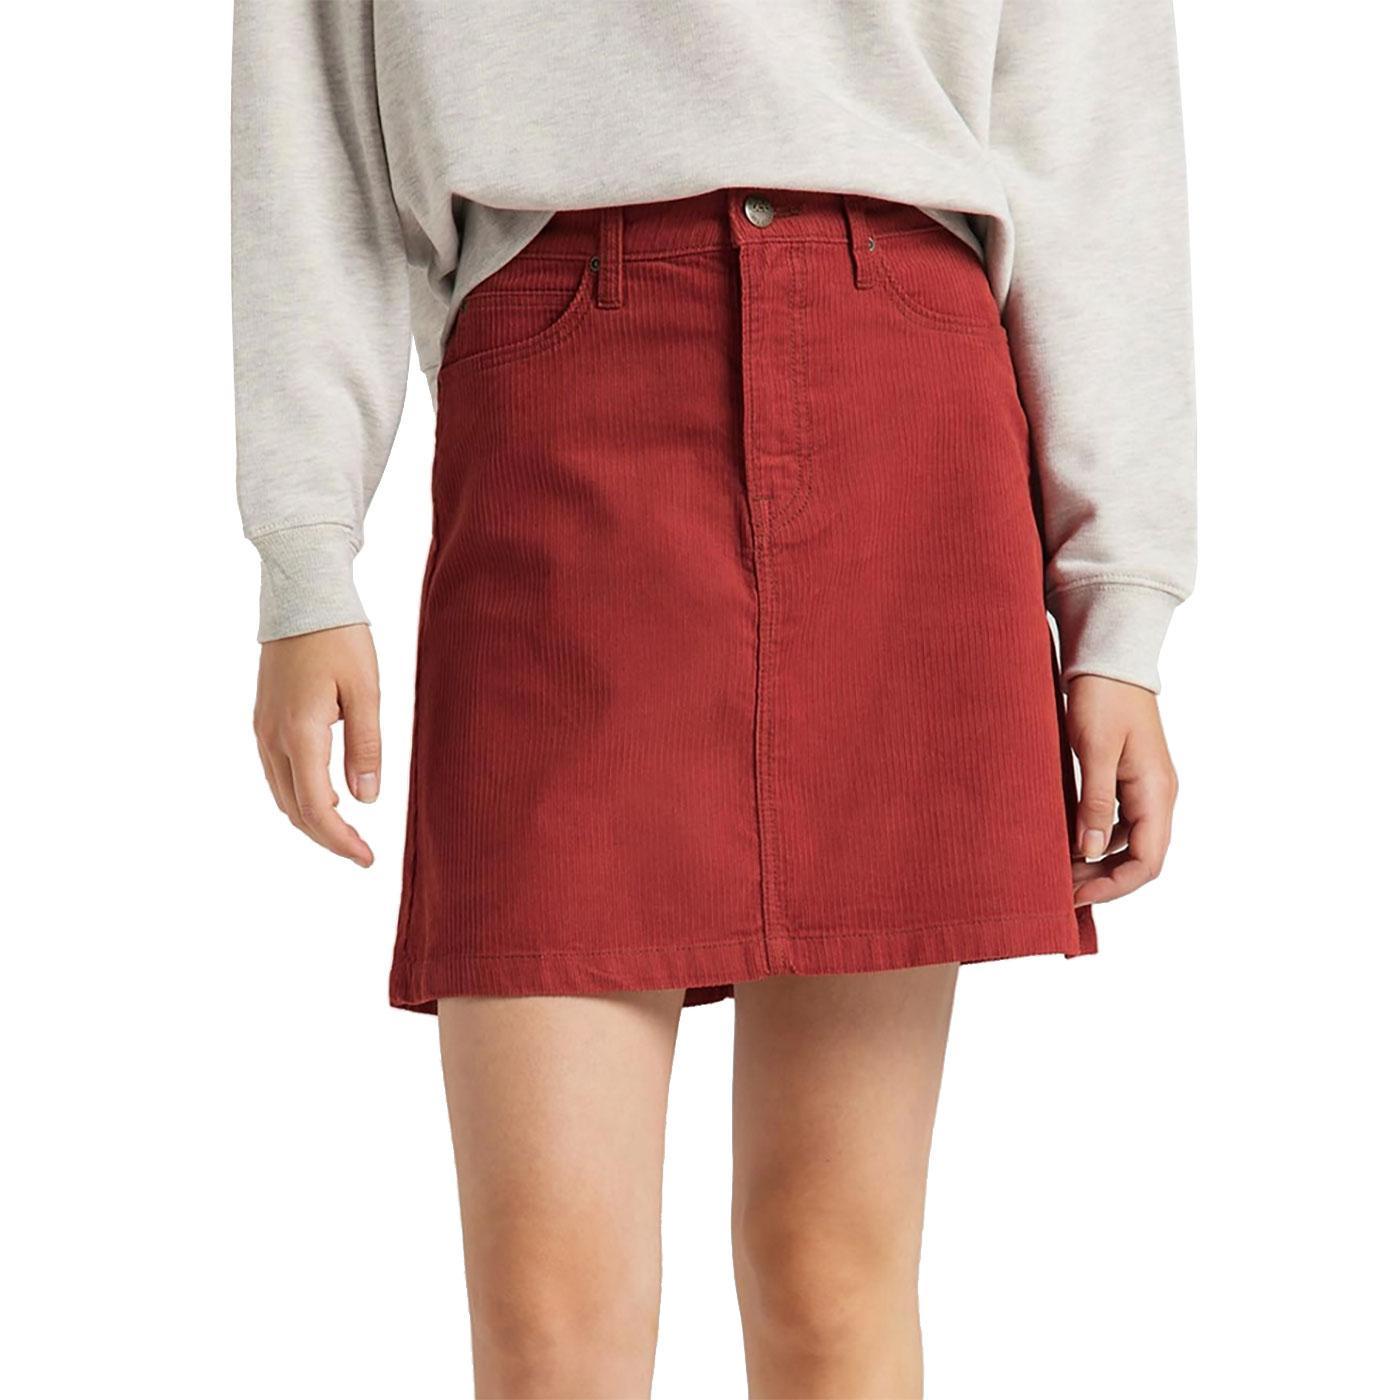 LEE Women's Retro Corduroy A-Line Mini Skirt RO